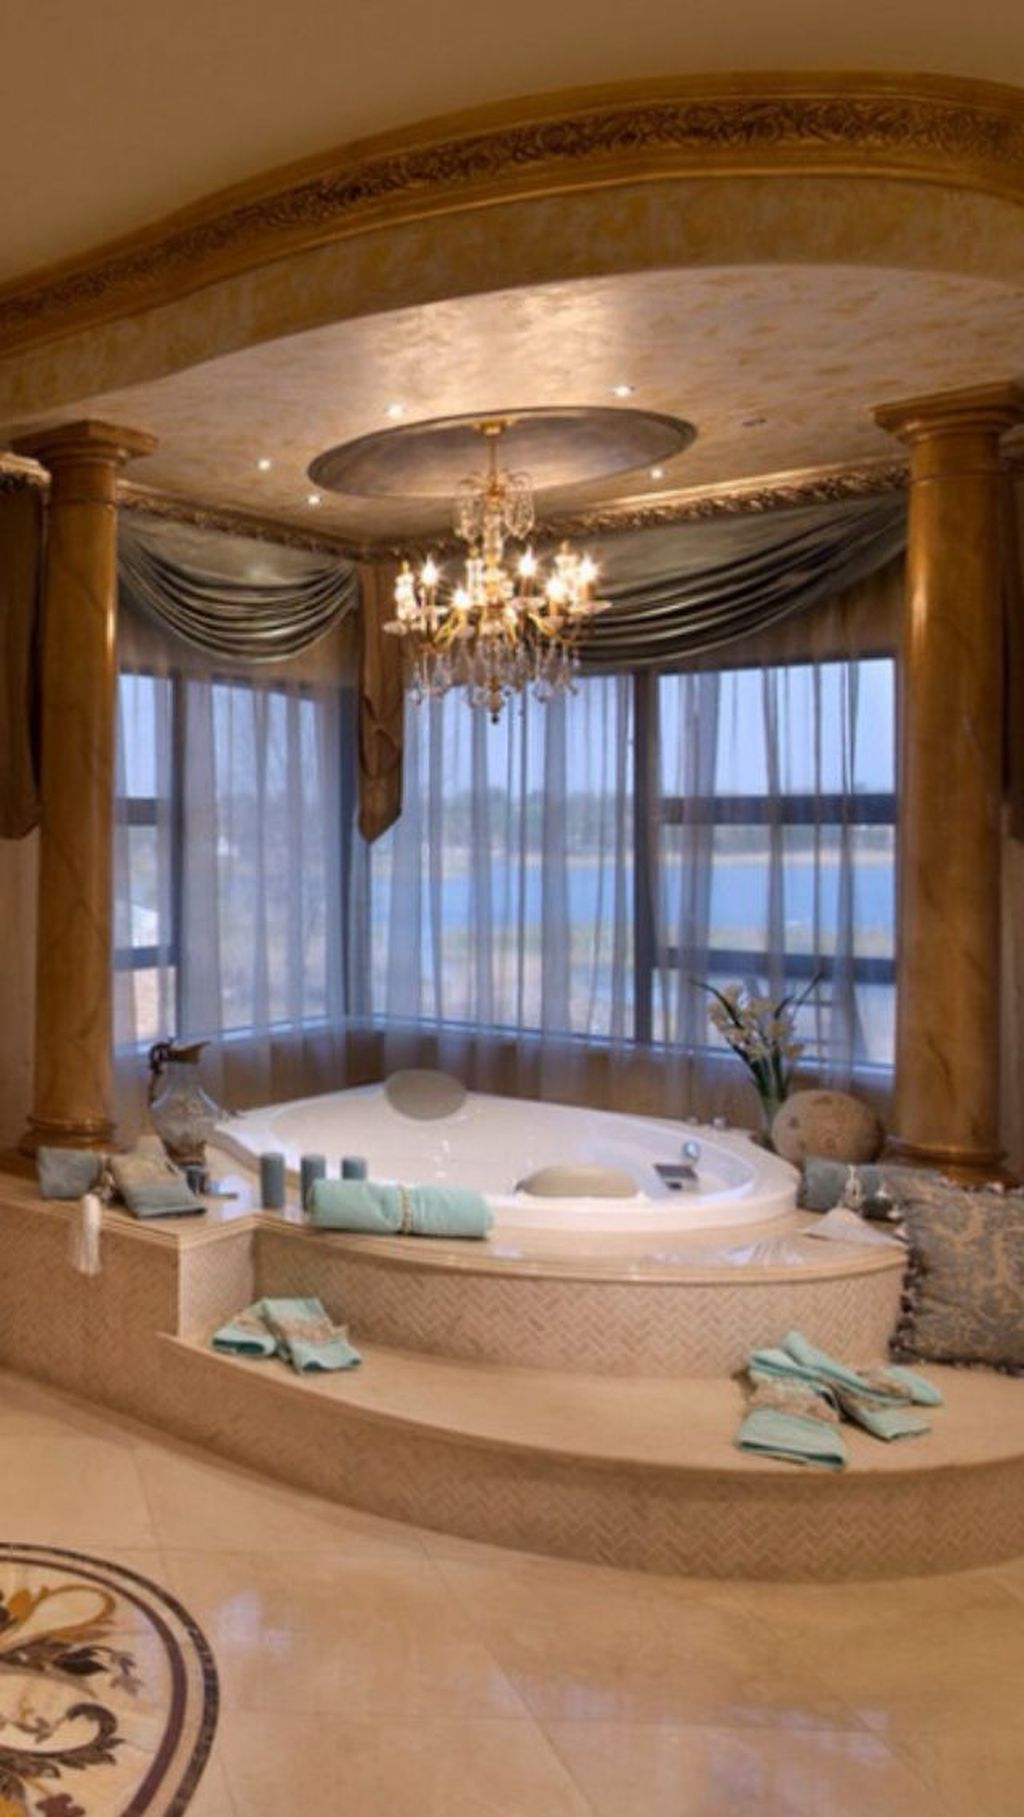 99 Romantic And Elegant Bathroom Design Ideas With Chandeliers